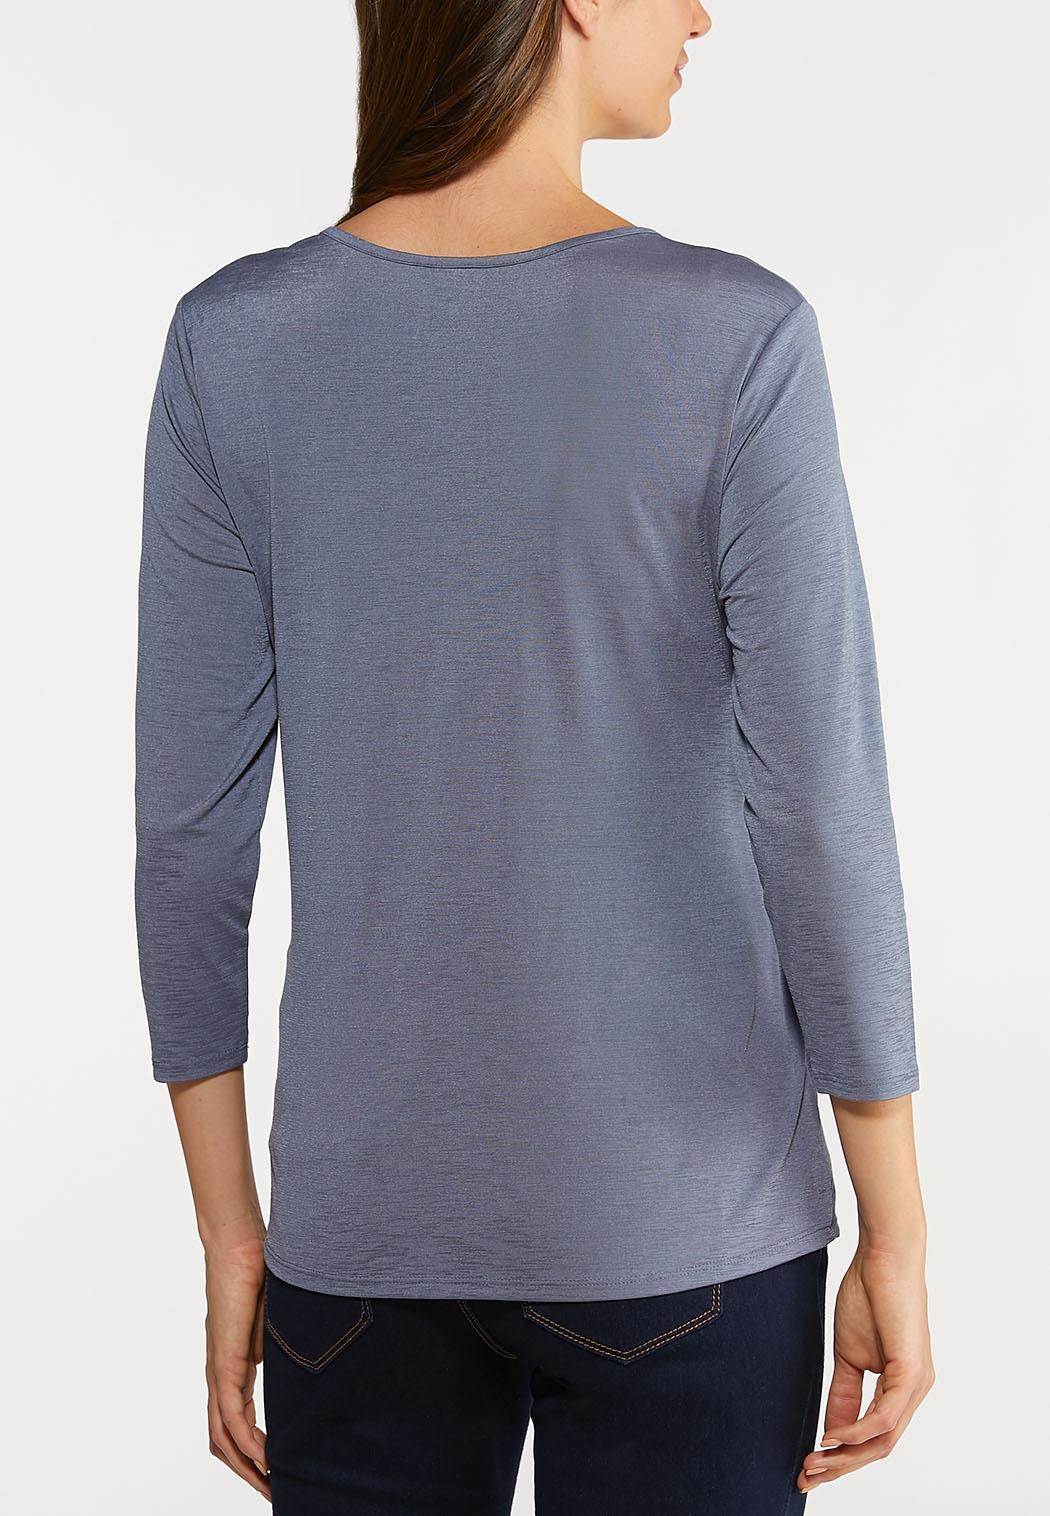 Asymmetrical Cinch Top (Item #44084296)